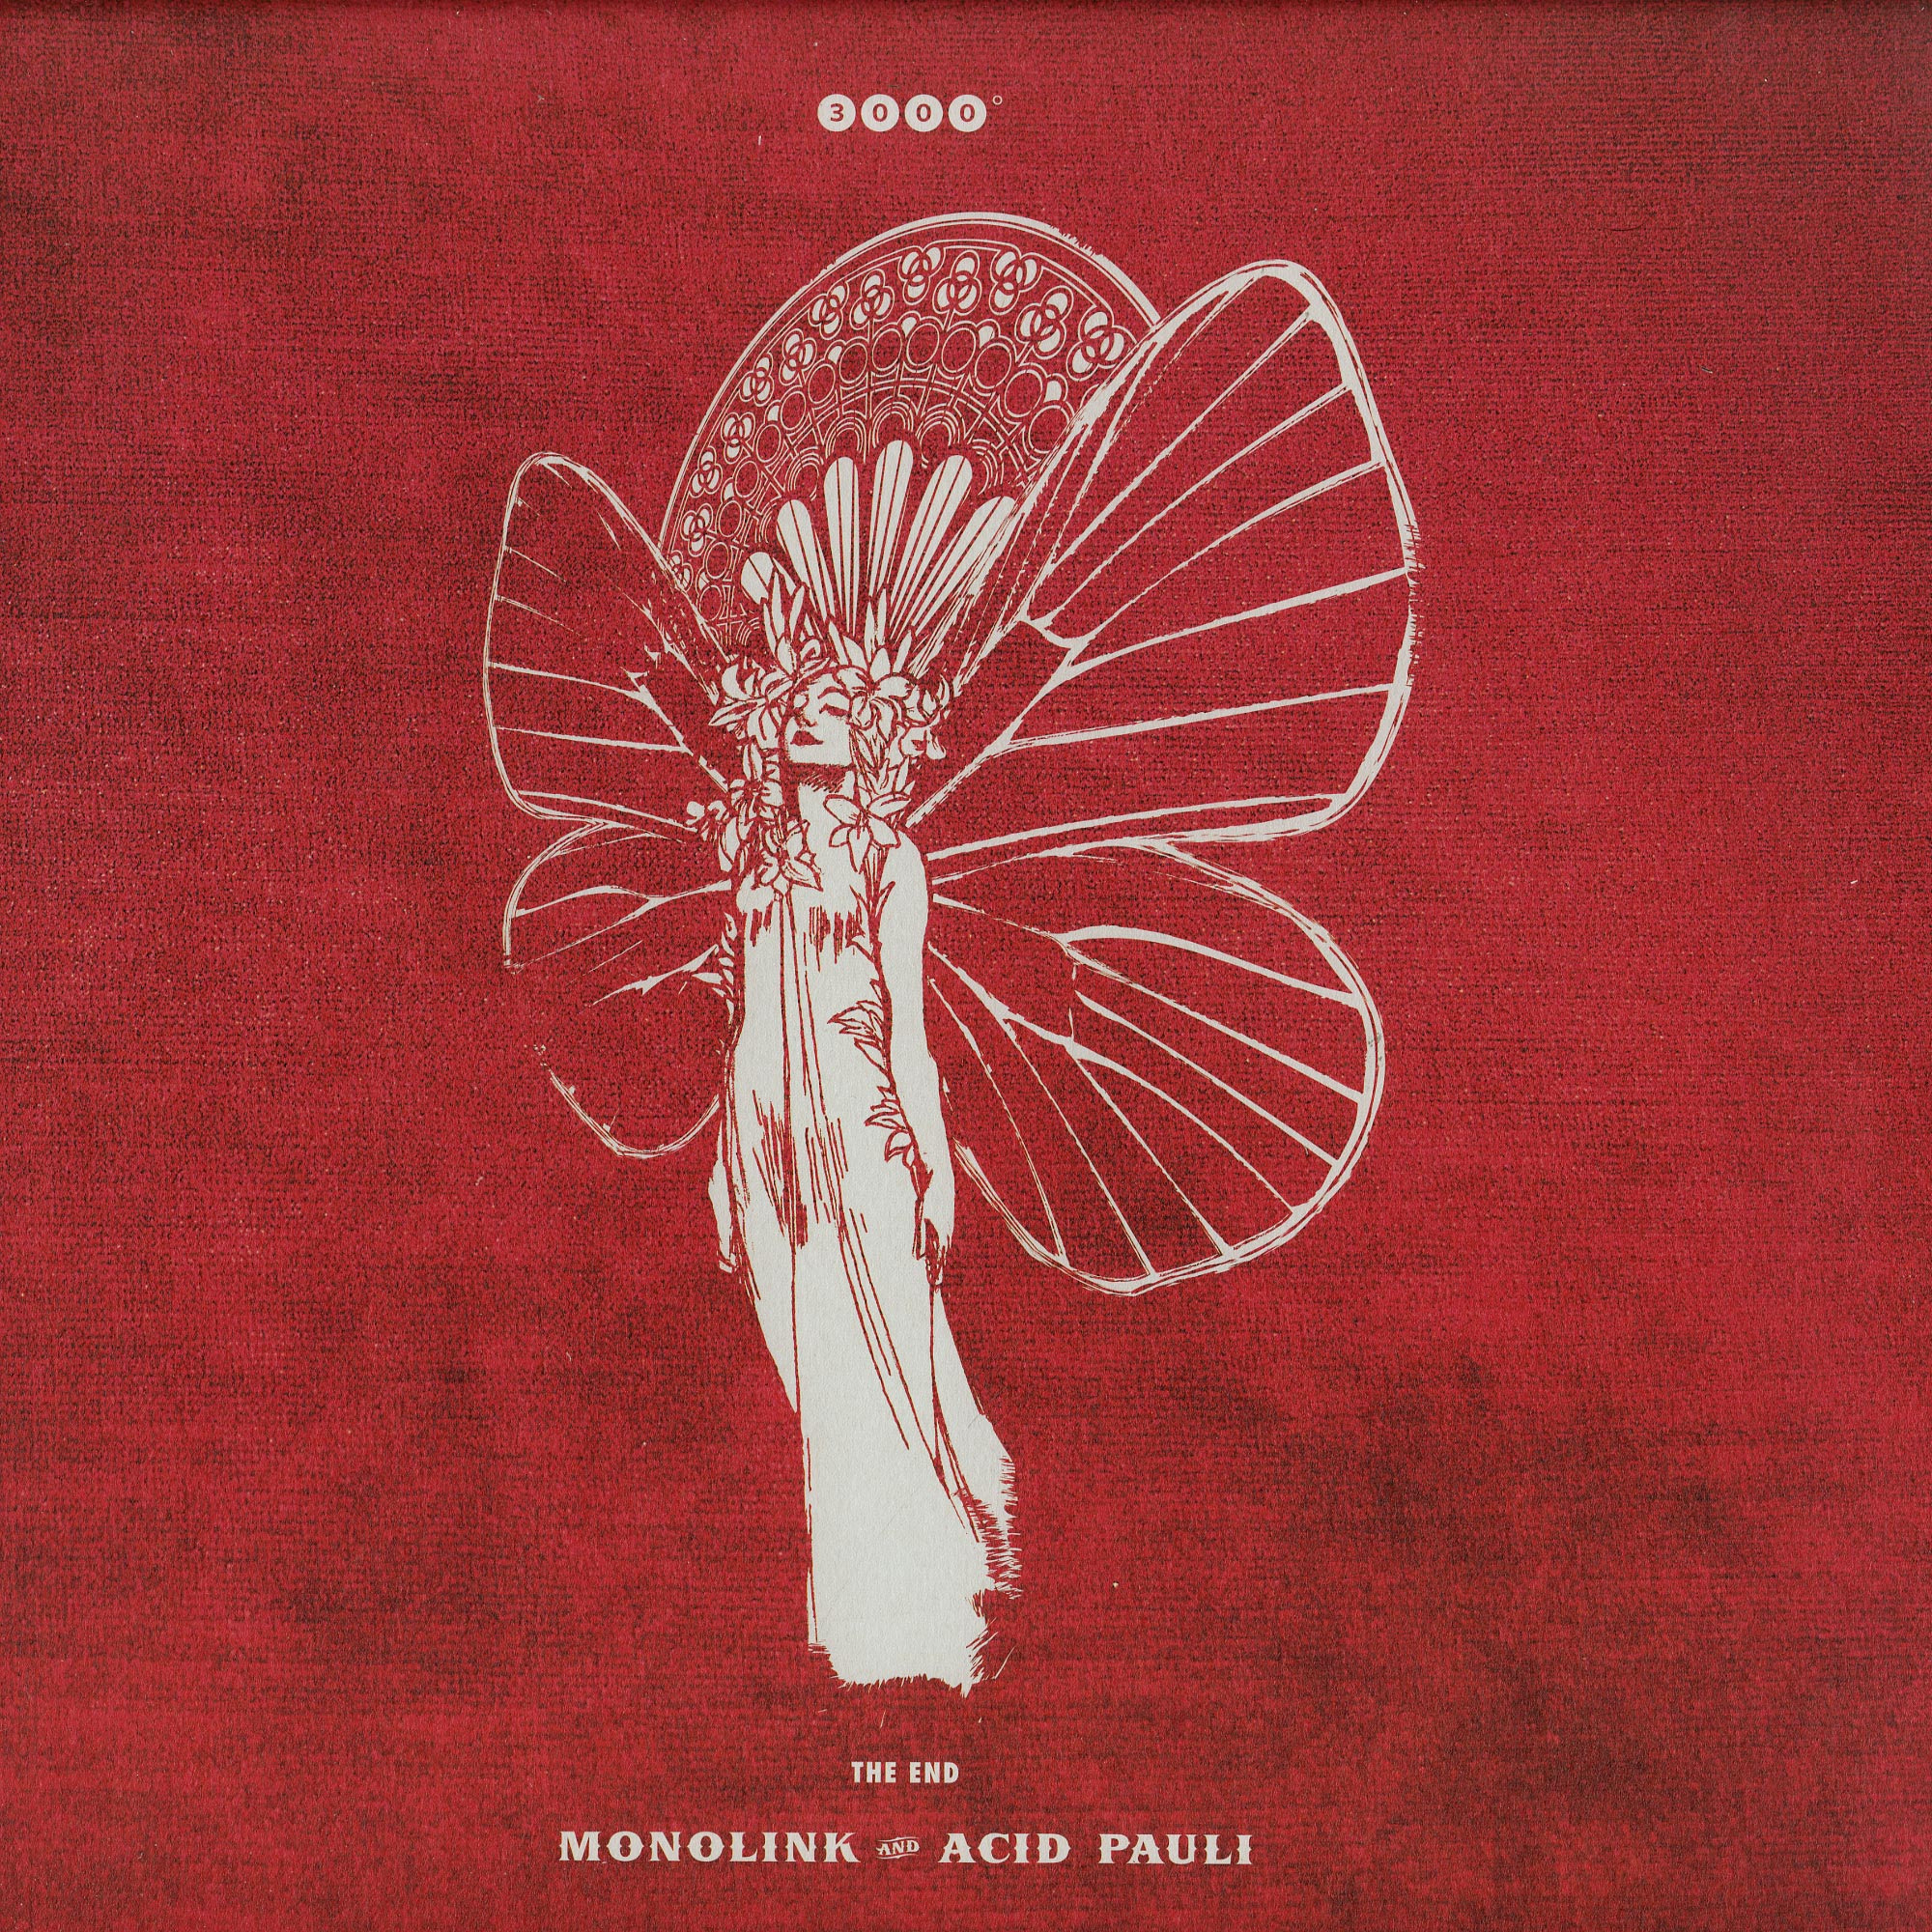 Monolink & Acid Pauli - THE END EP